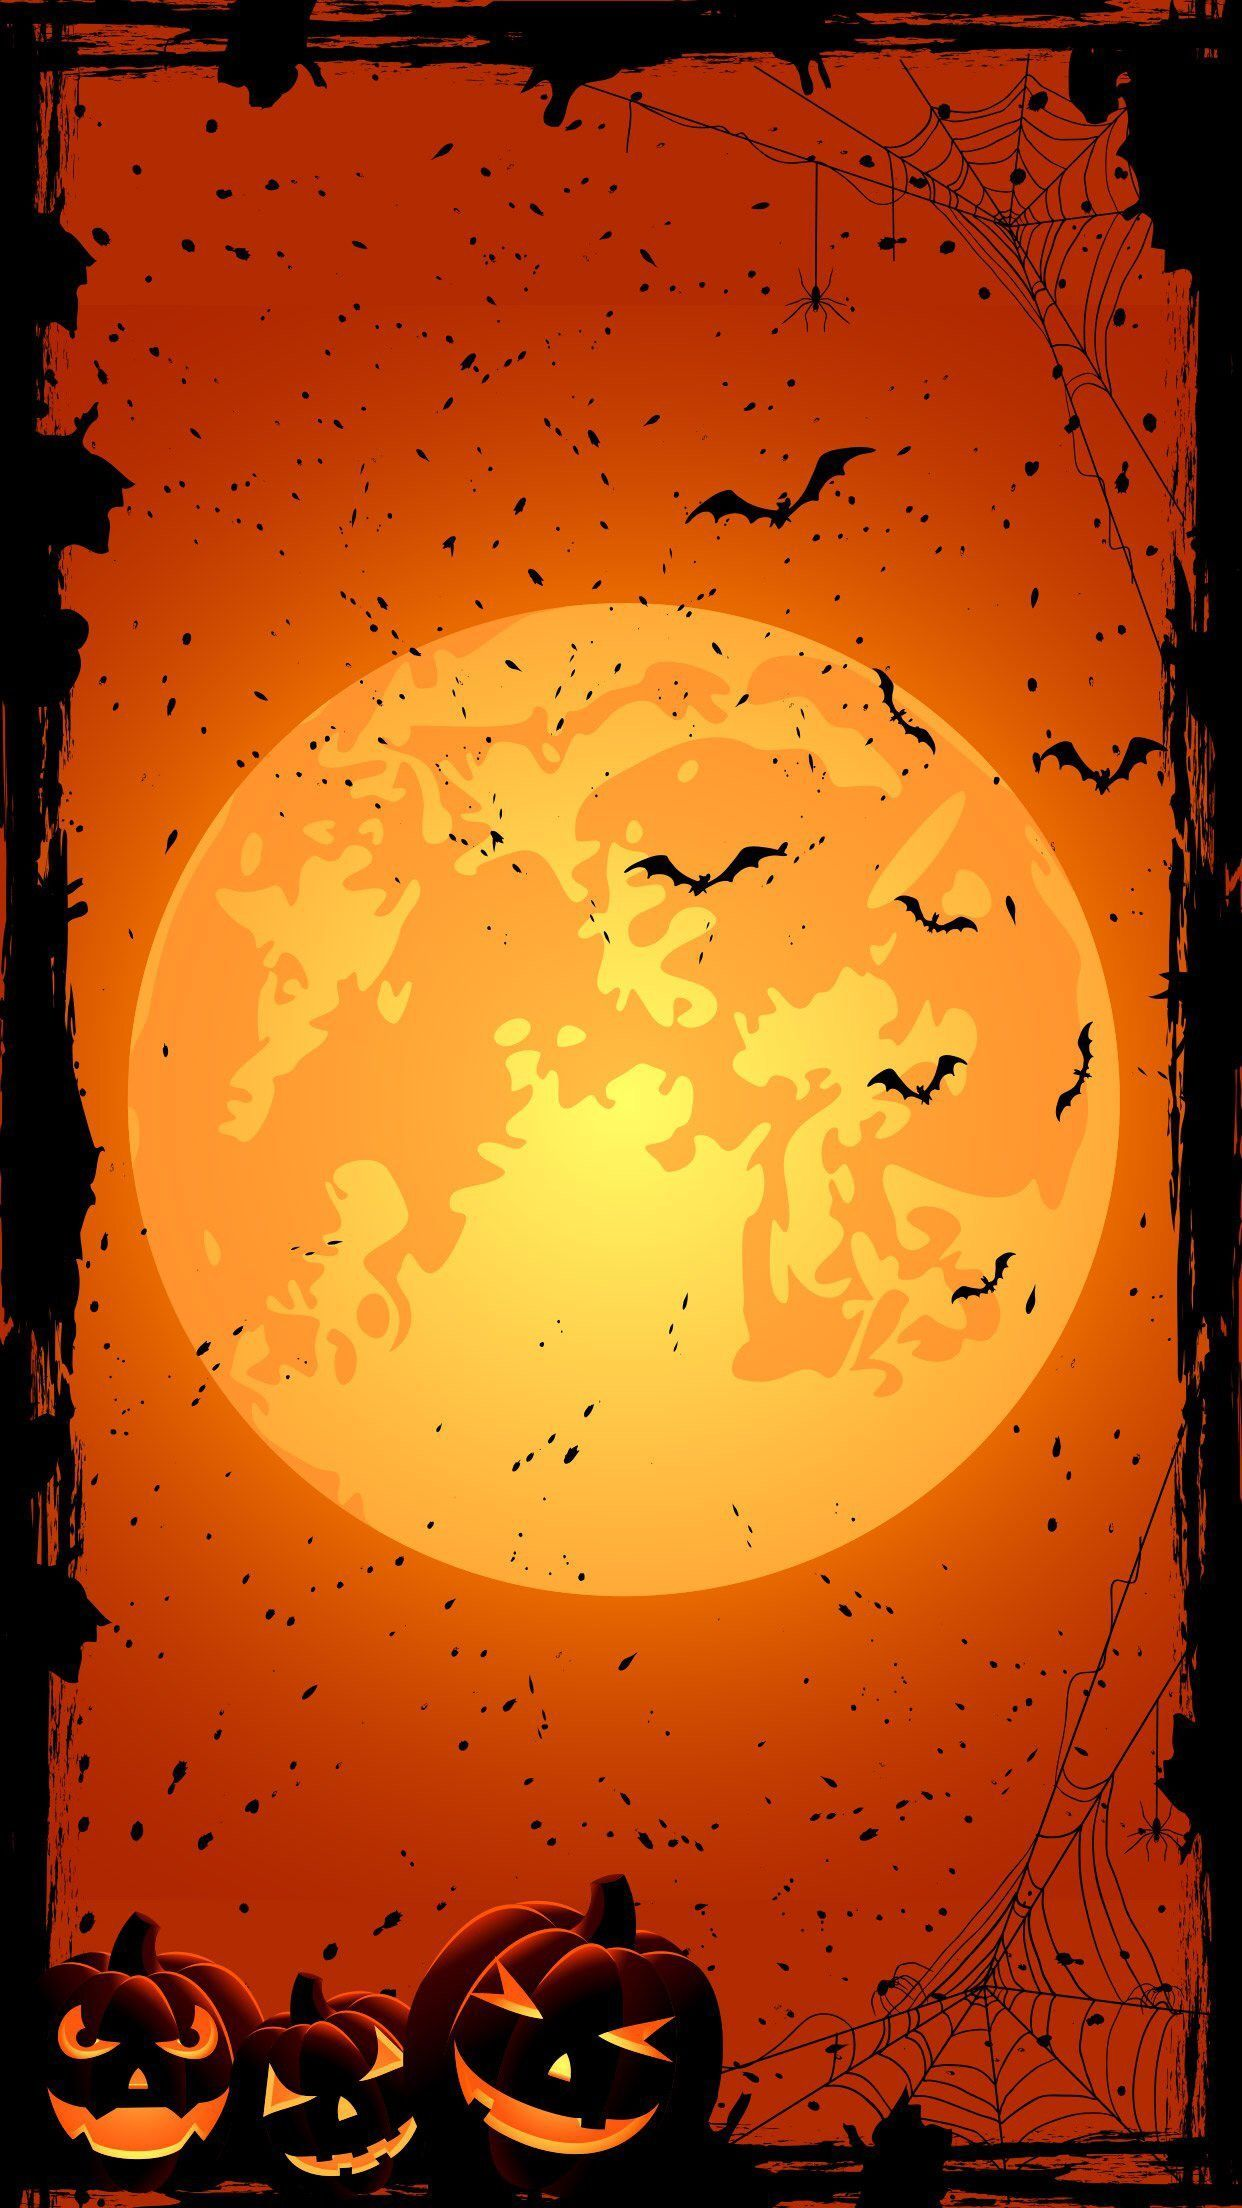 Halloween Wallpaper Horizontal Pumpkin For Halloween On Dark Wooden Background Using For Wallpaper Horizontal View Buy In 2020 Halloween Wallpaper Halloween Wallpaper Iphone Halloween Backgrounds